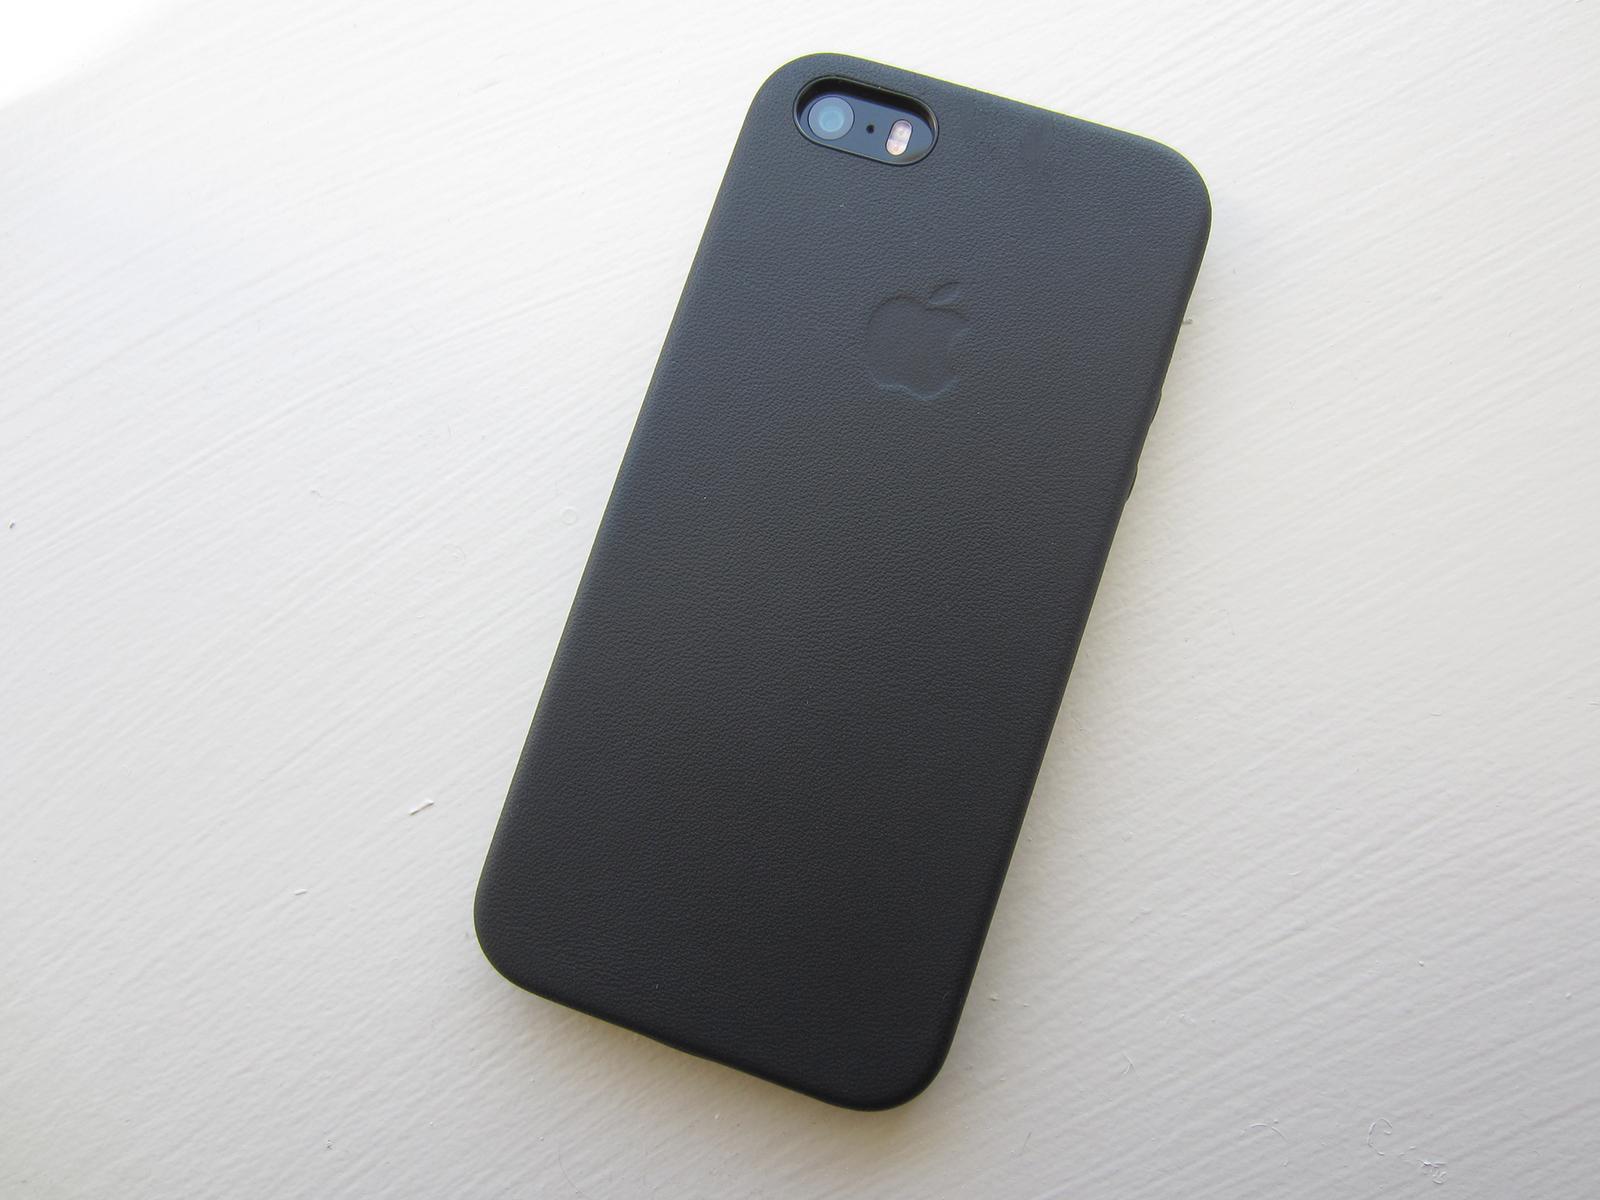 apple 39 s iphone 5s case the first case i 39 ve ever remotely. Black Bedroom Furniture Sets. Home Design Ideas